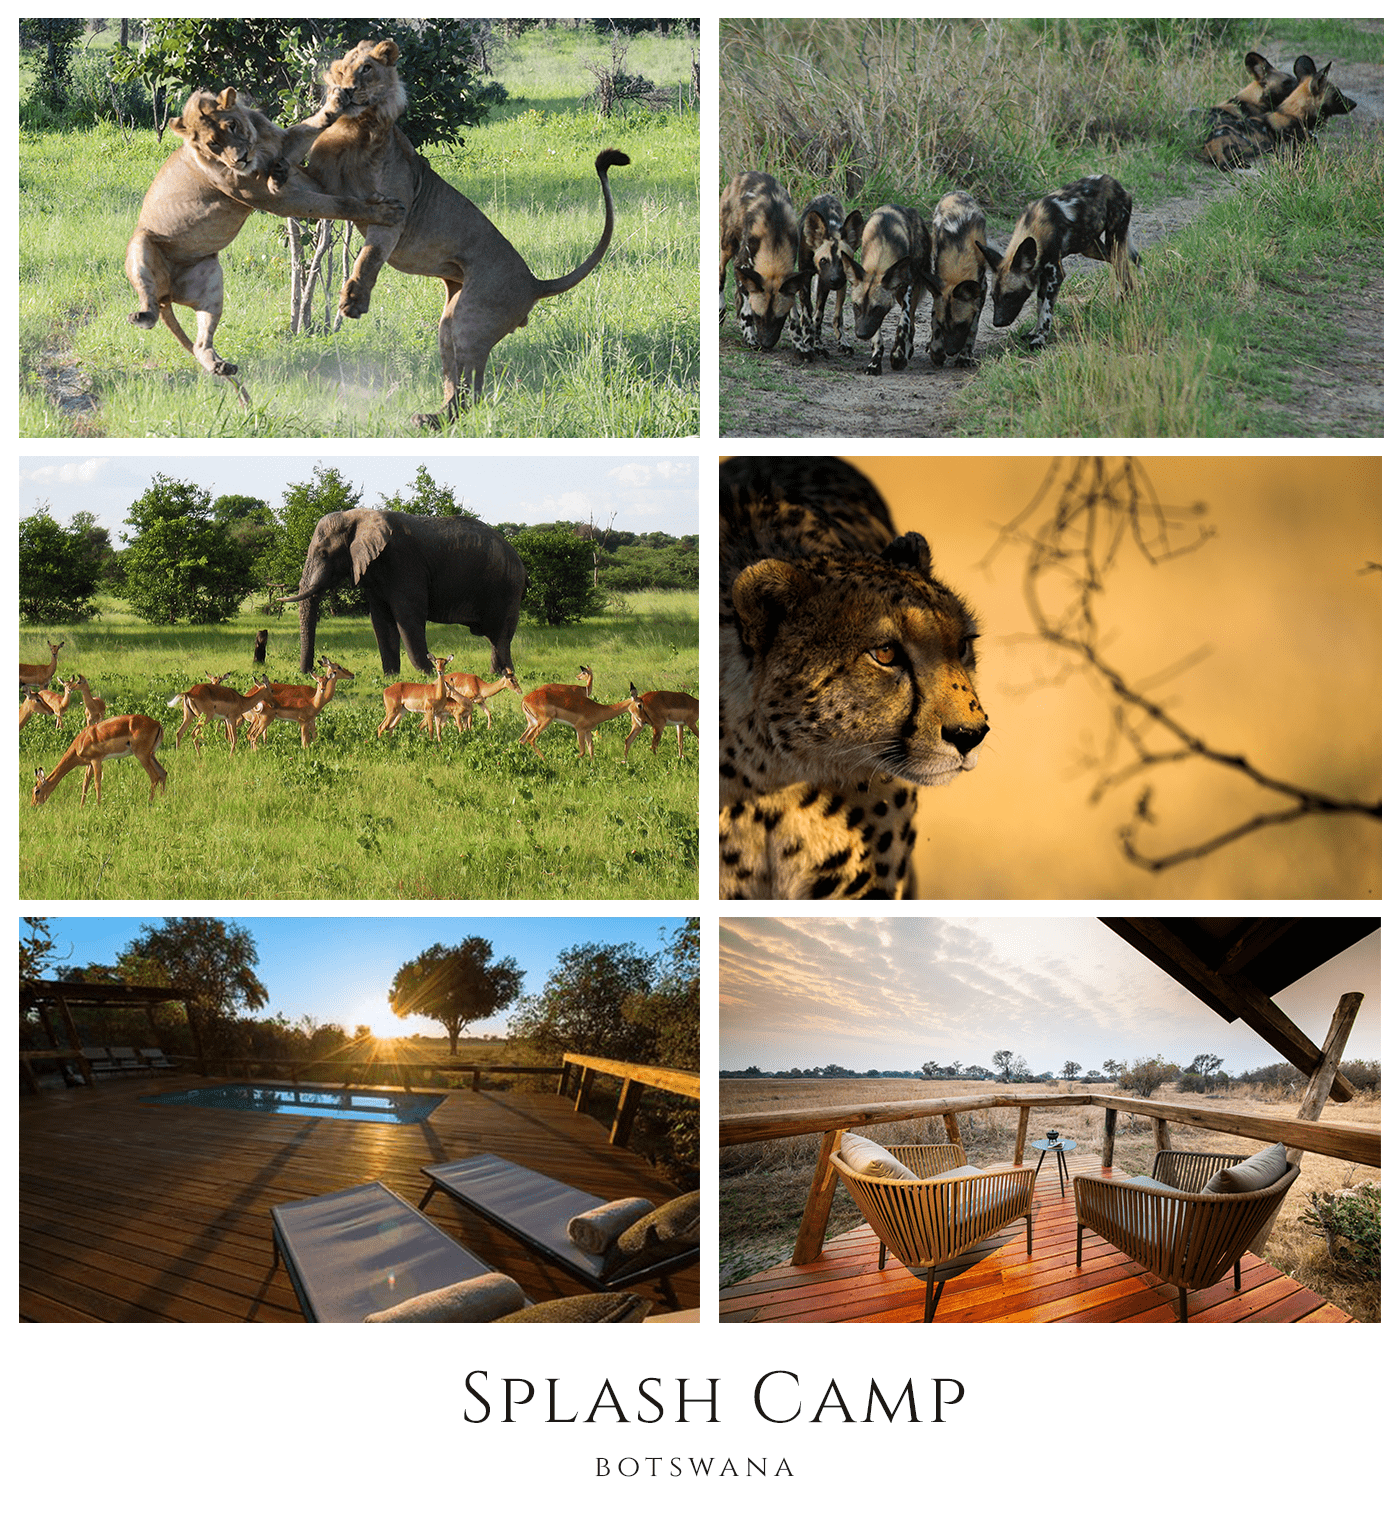 Lions, wild dogs, elephants and cheetahs at Kwando Splash Camp in Botswana